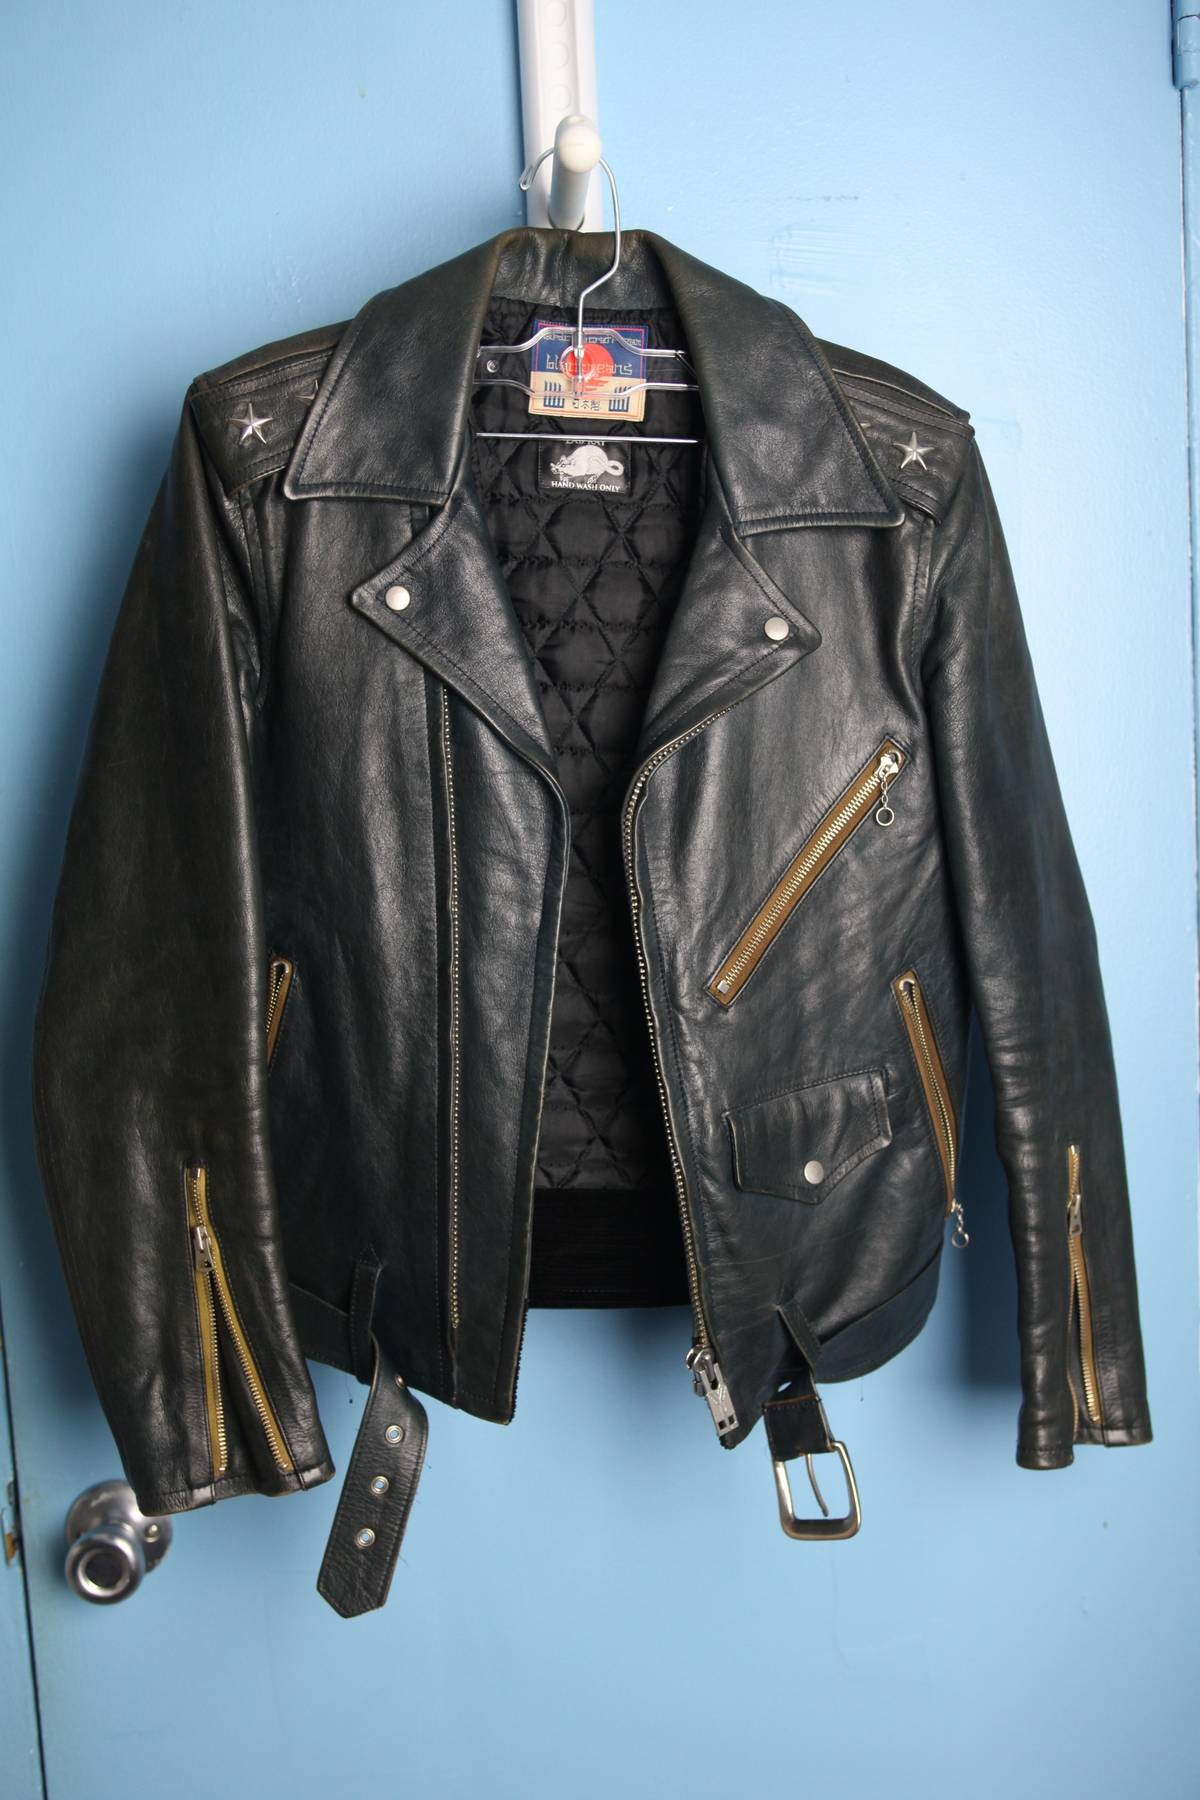 Blackmeans Sid Vicious Leather Jacket Grailed